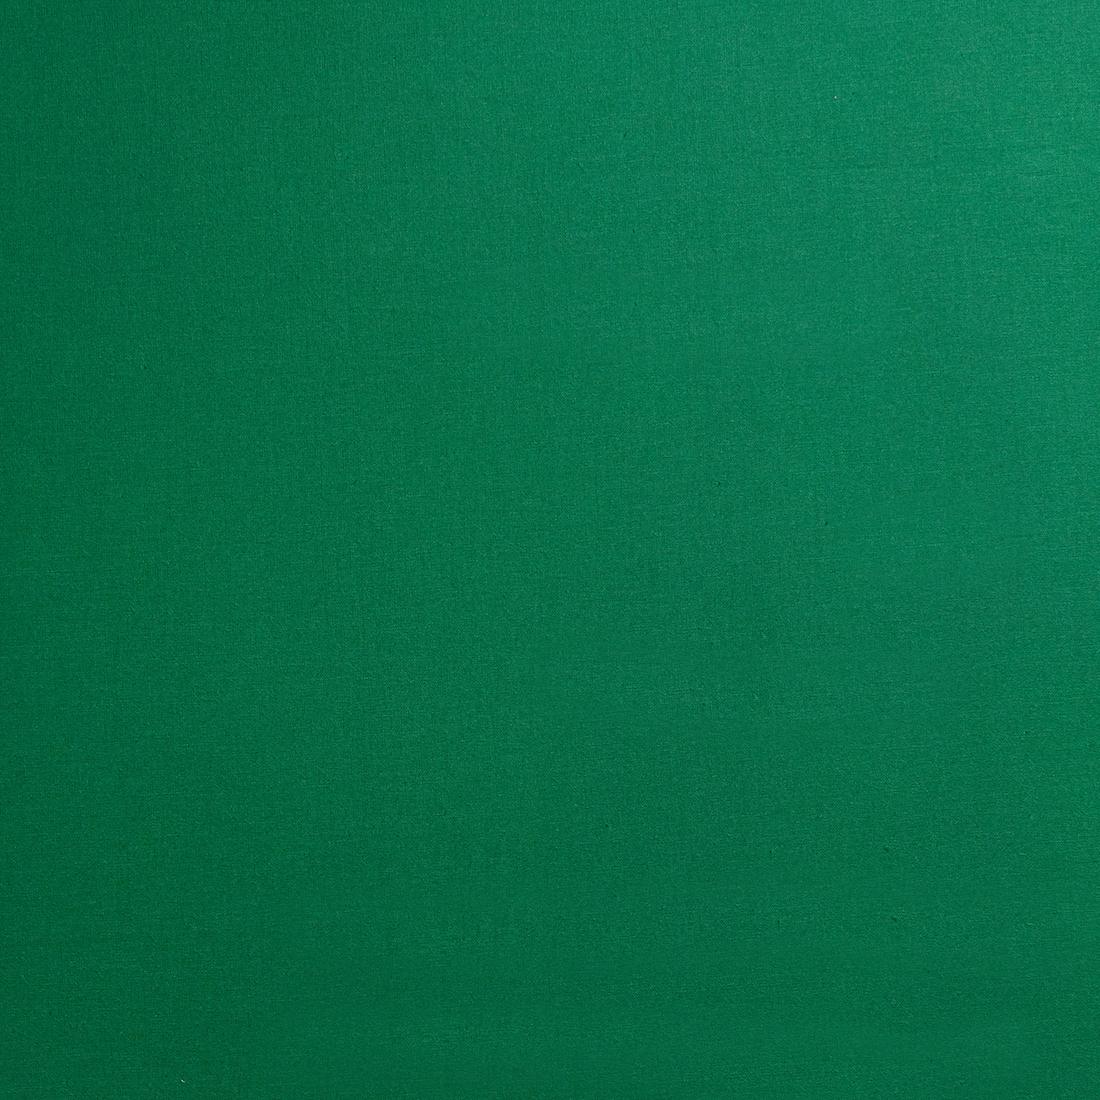 Craft Cotton Emerald Fabric